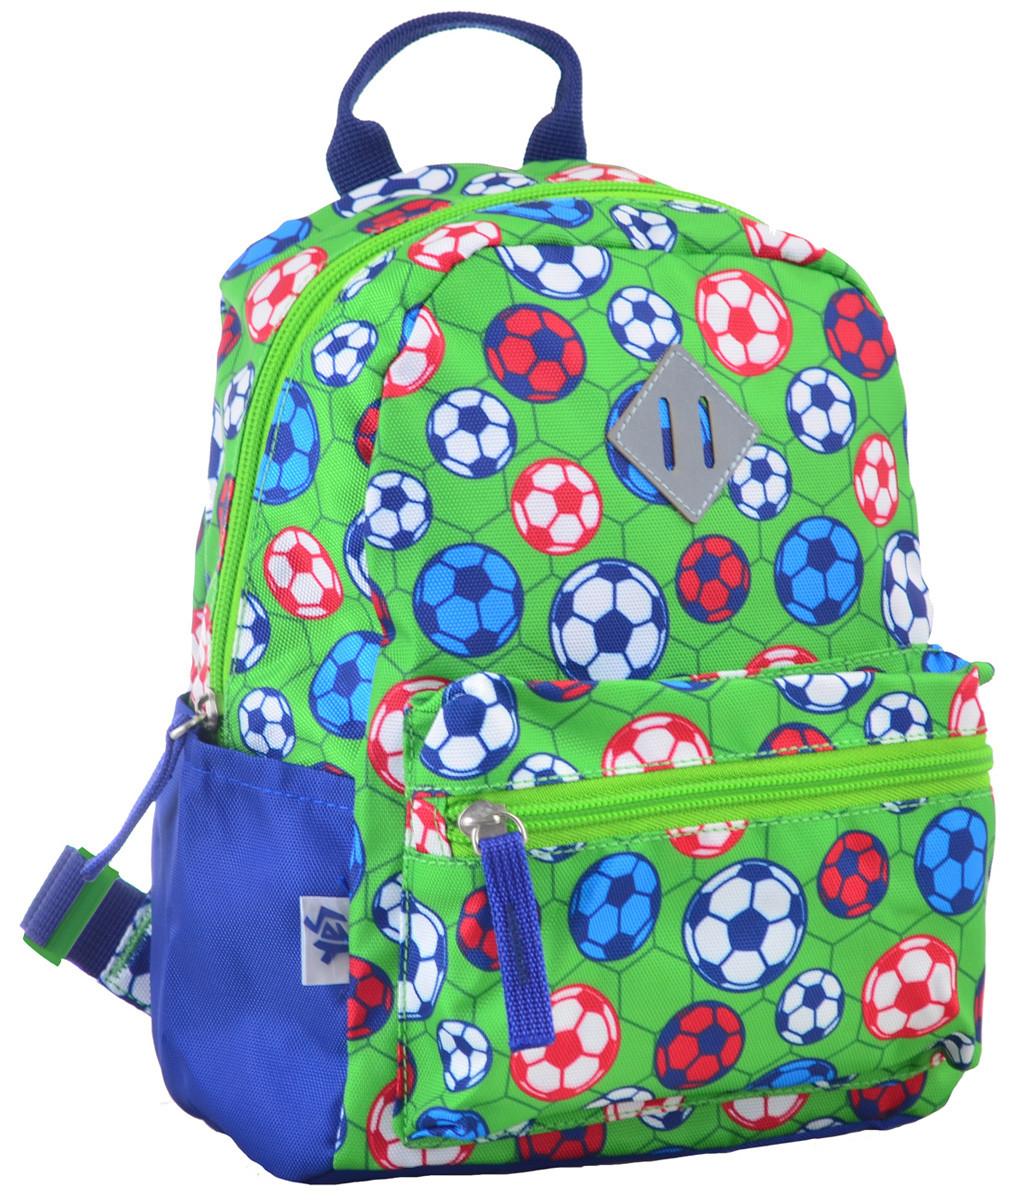 Рюкзак детский YES K-19 Football, 24.5*20*11 555311